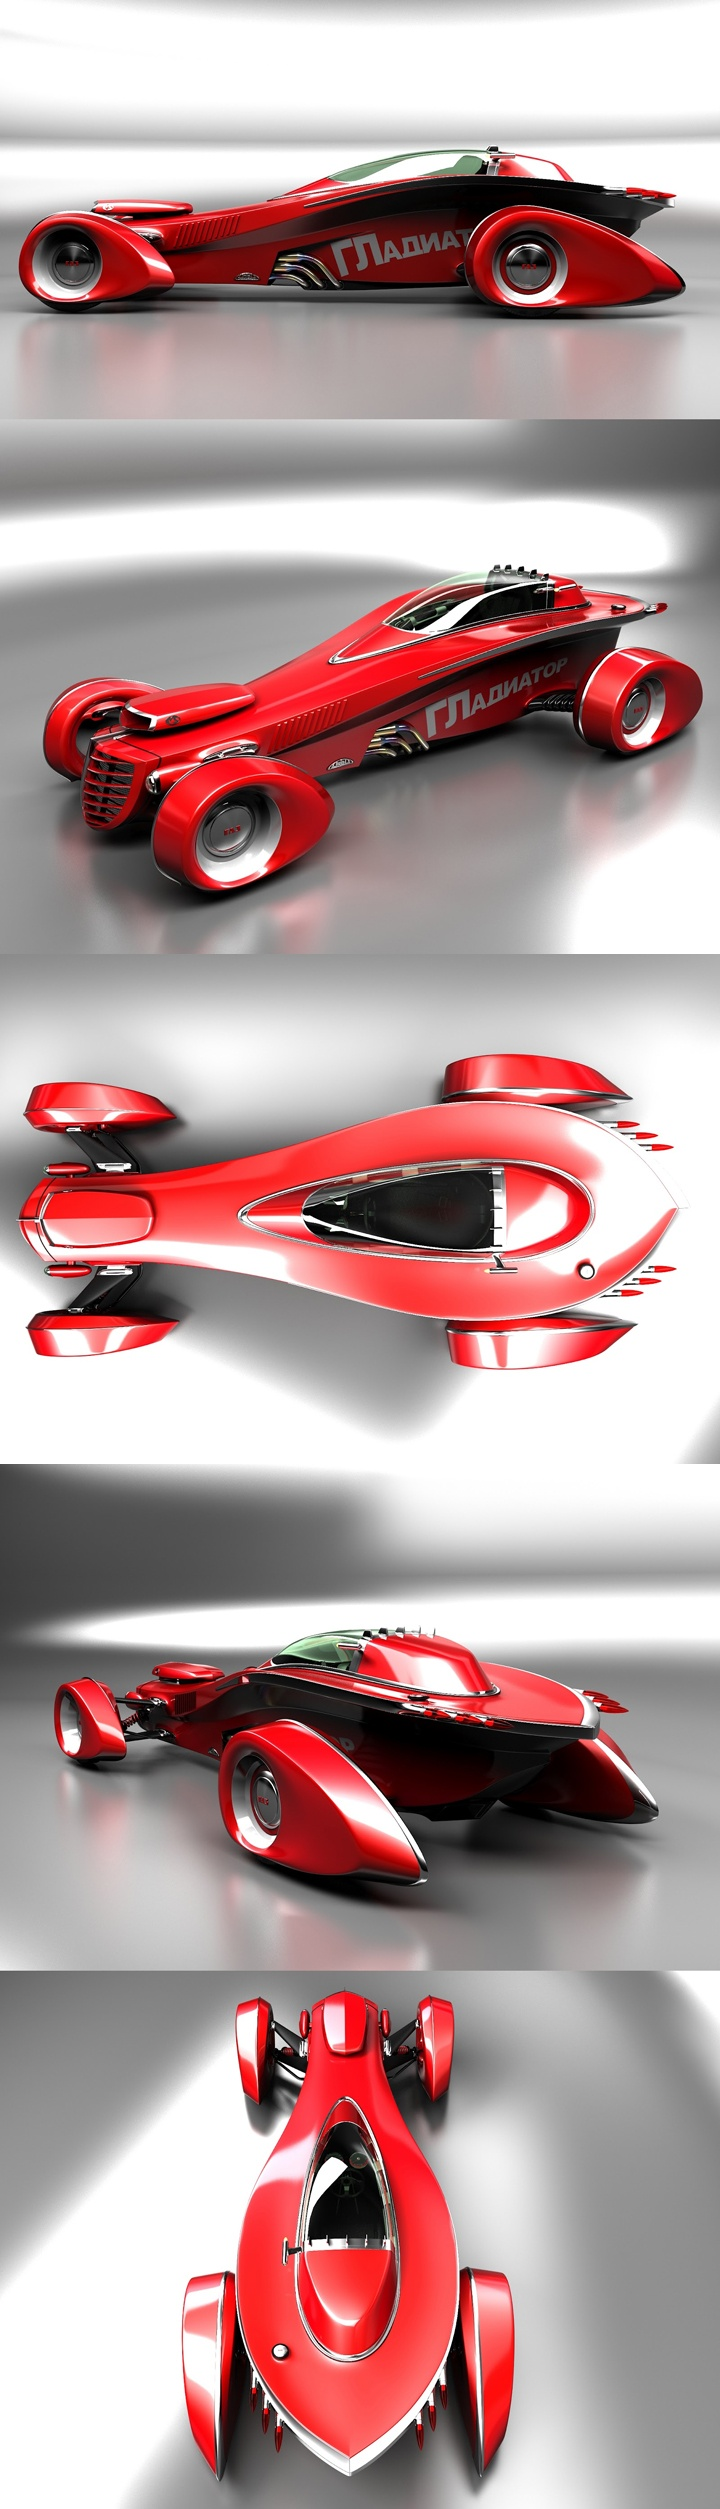 Gladiator concept car red